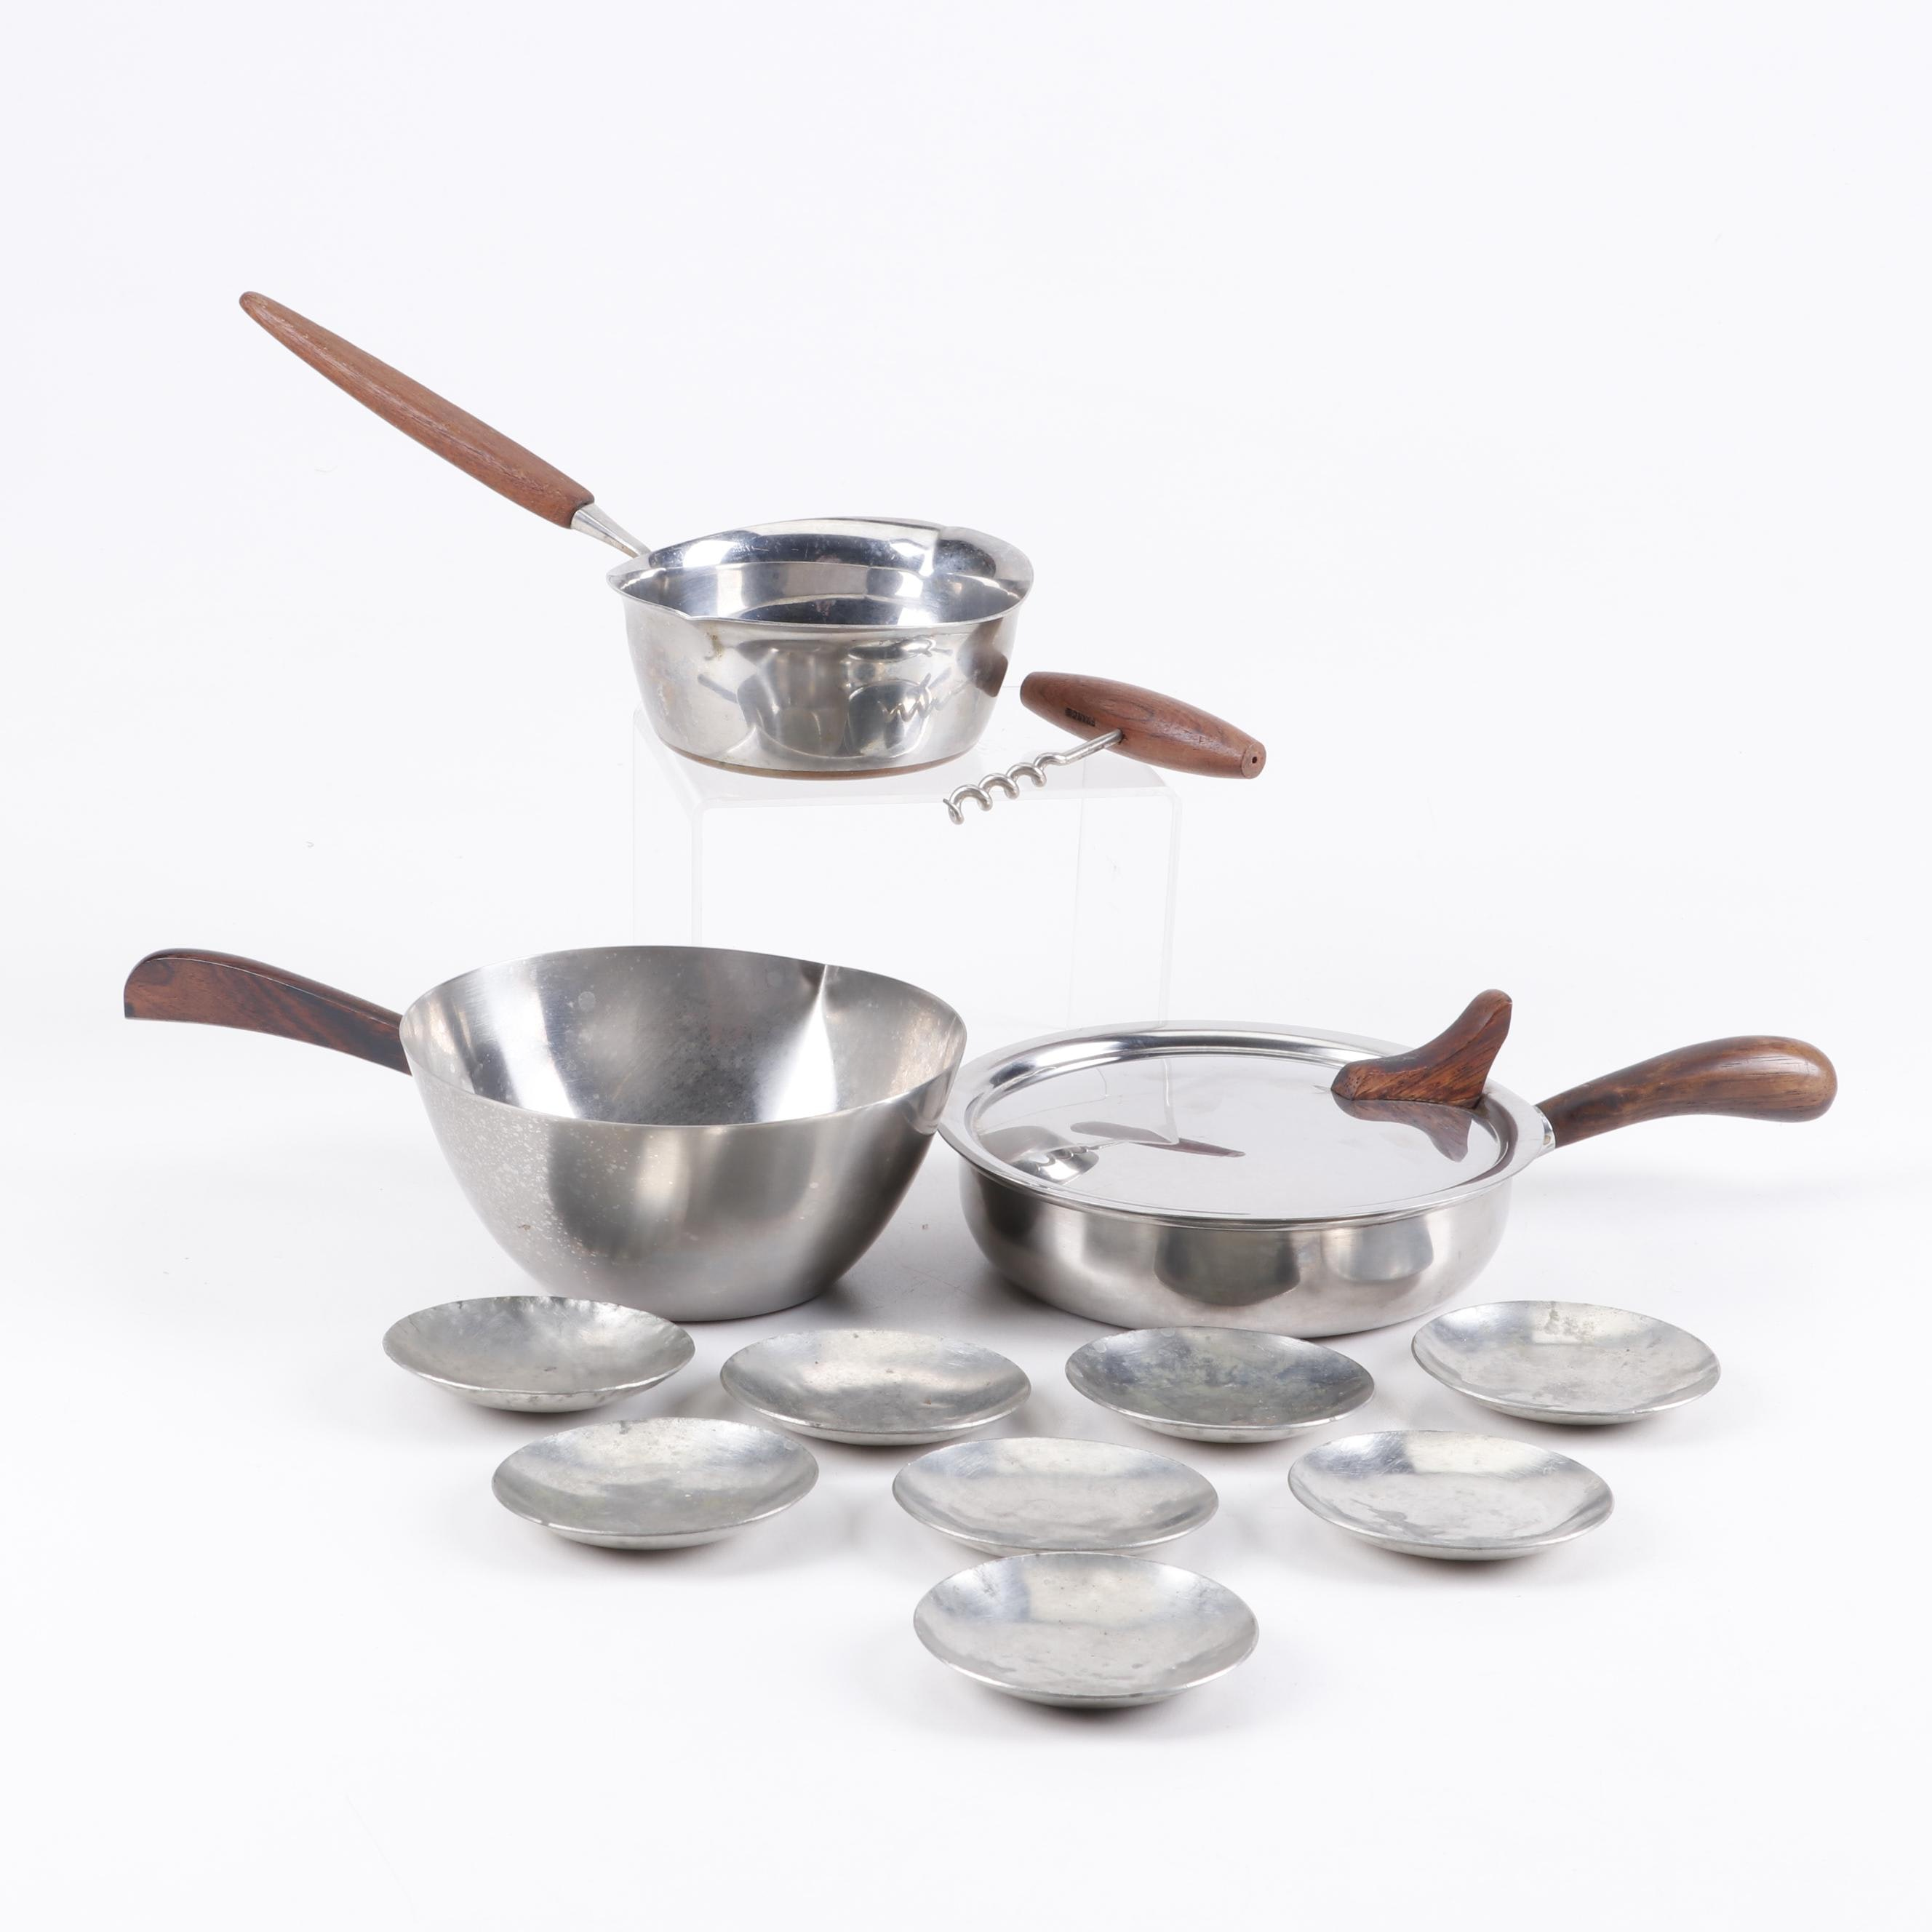 Scandinavian Modern Kitchenware, Mid 20th Century